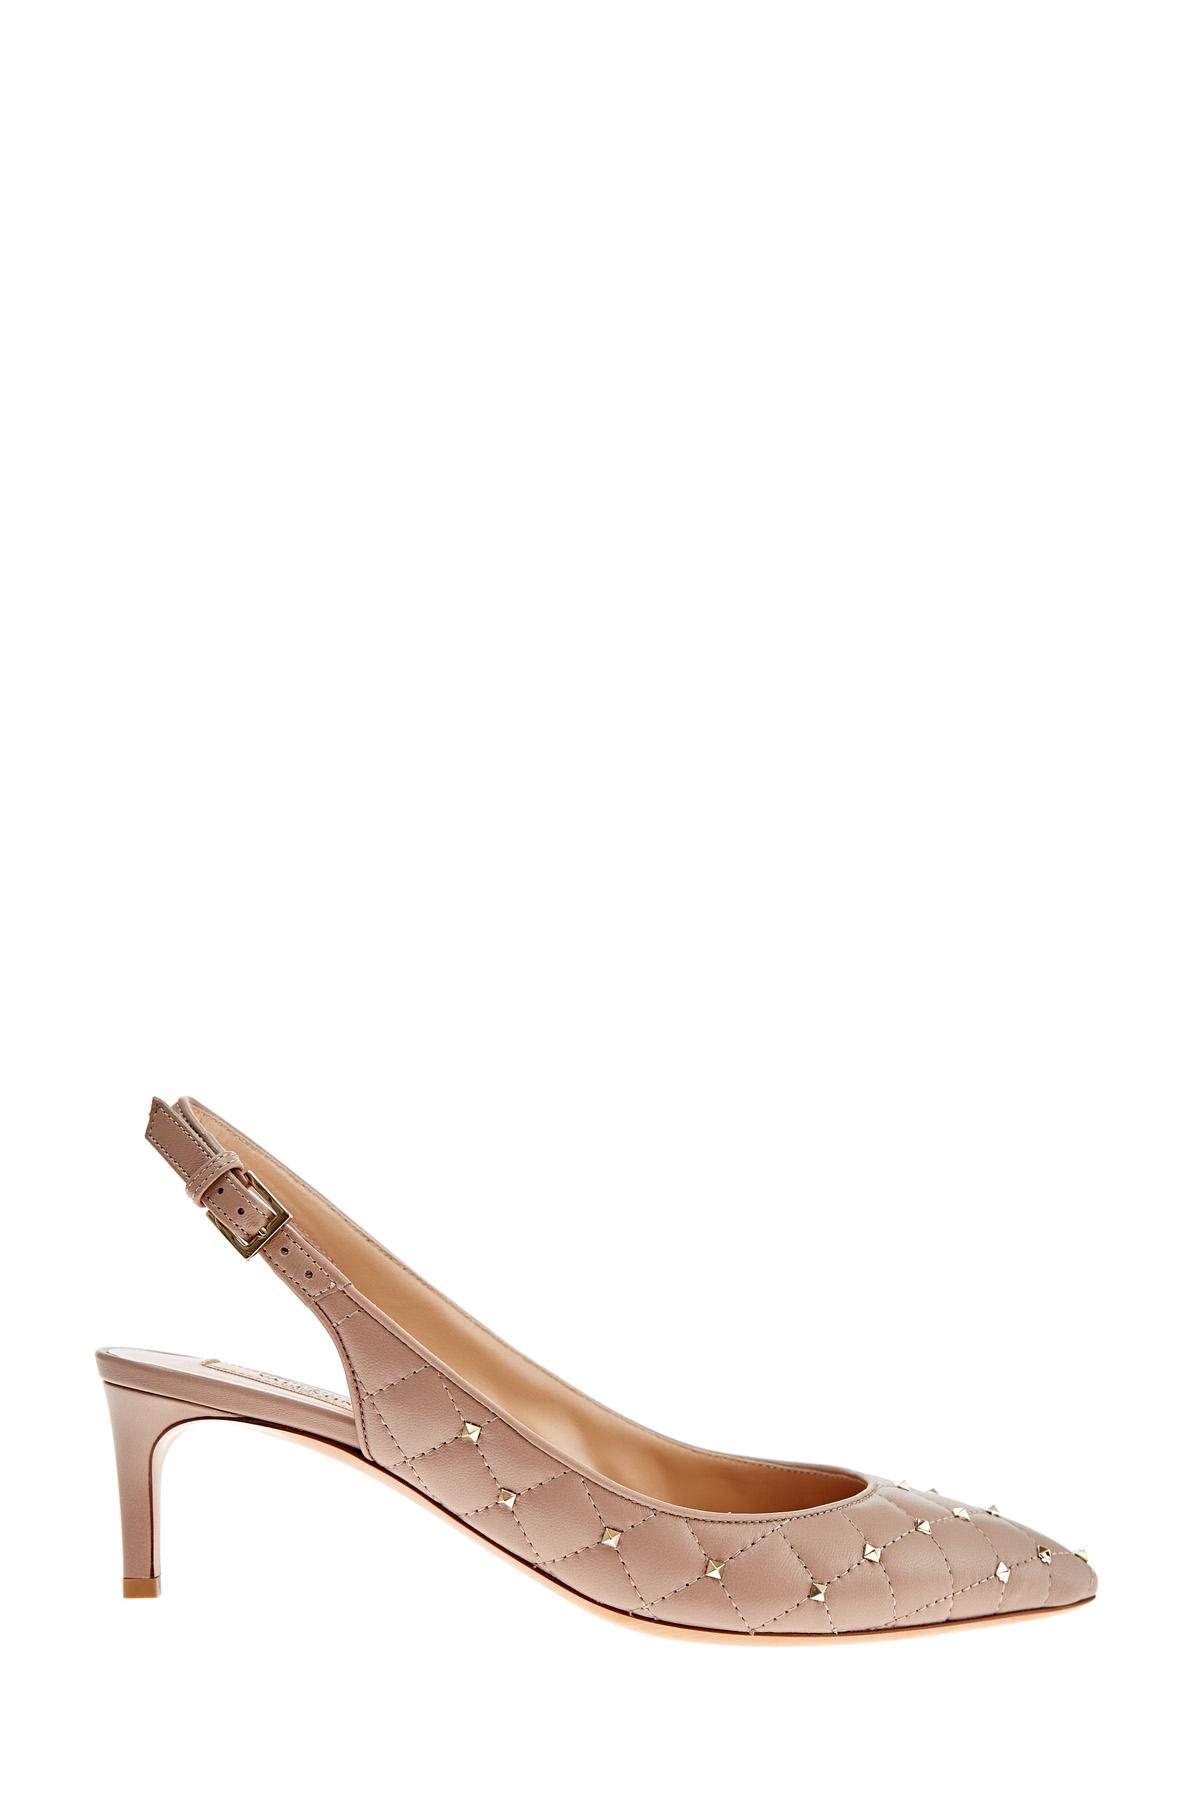 Купить Туфли Rockstud Spike со стеганым узором и каблуком kitten-heel, VALENTINO, Италия, кожа 100%